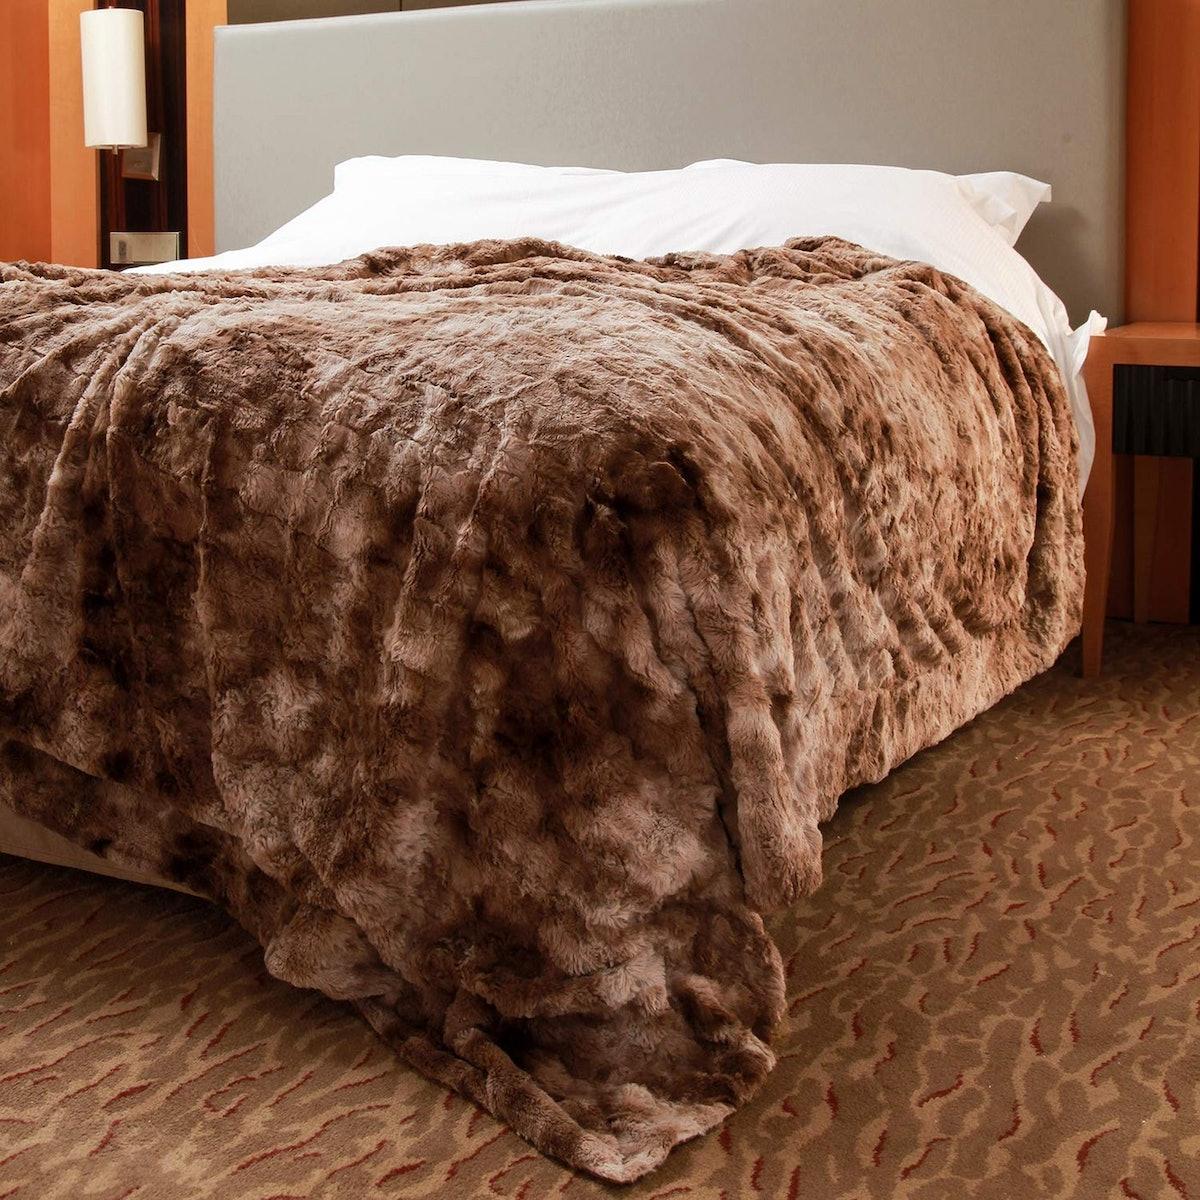 softan Faux Fur Blanket